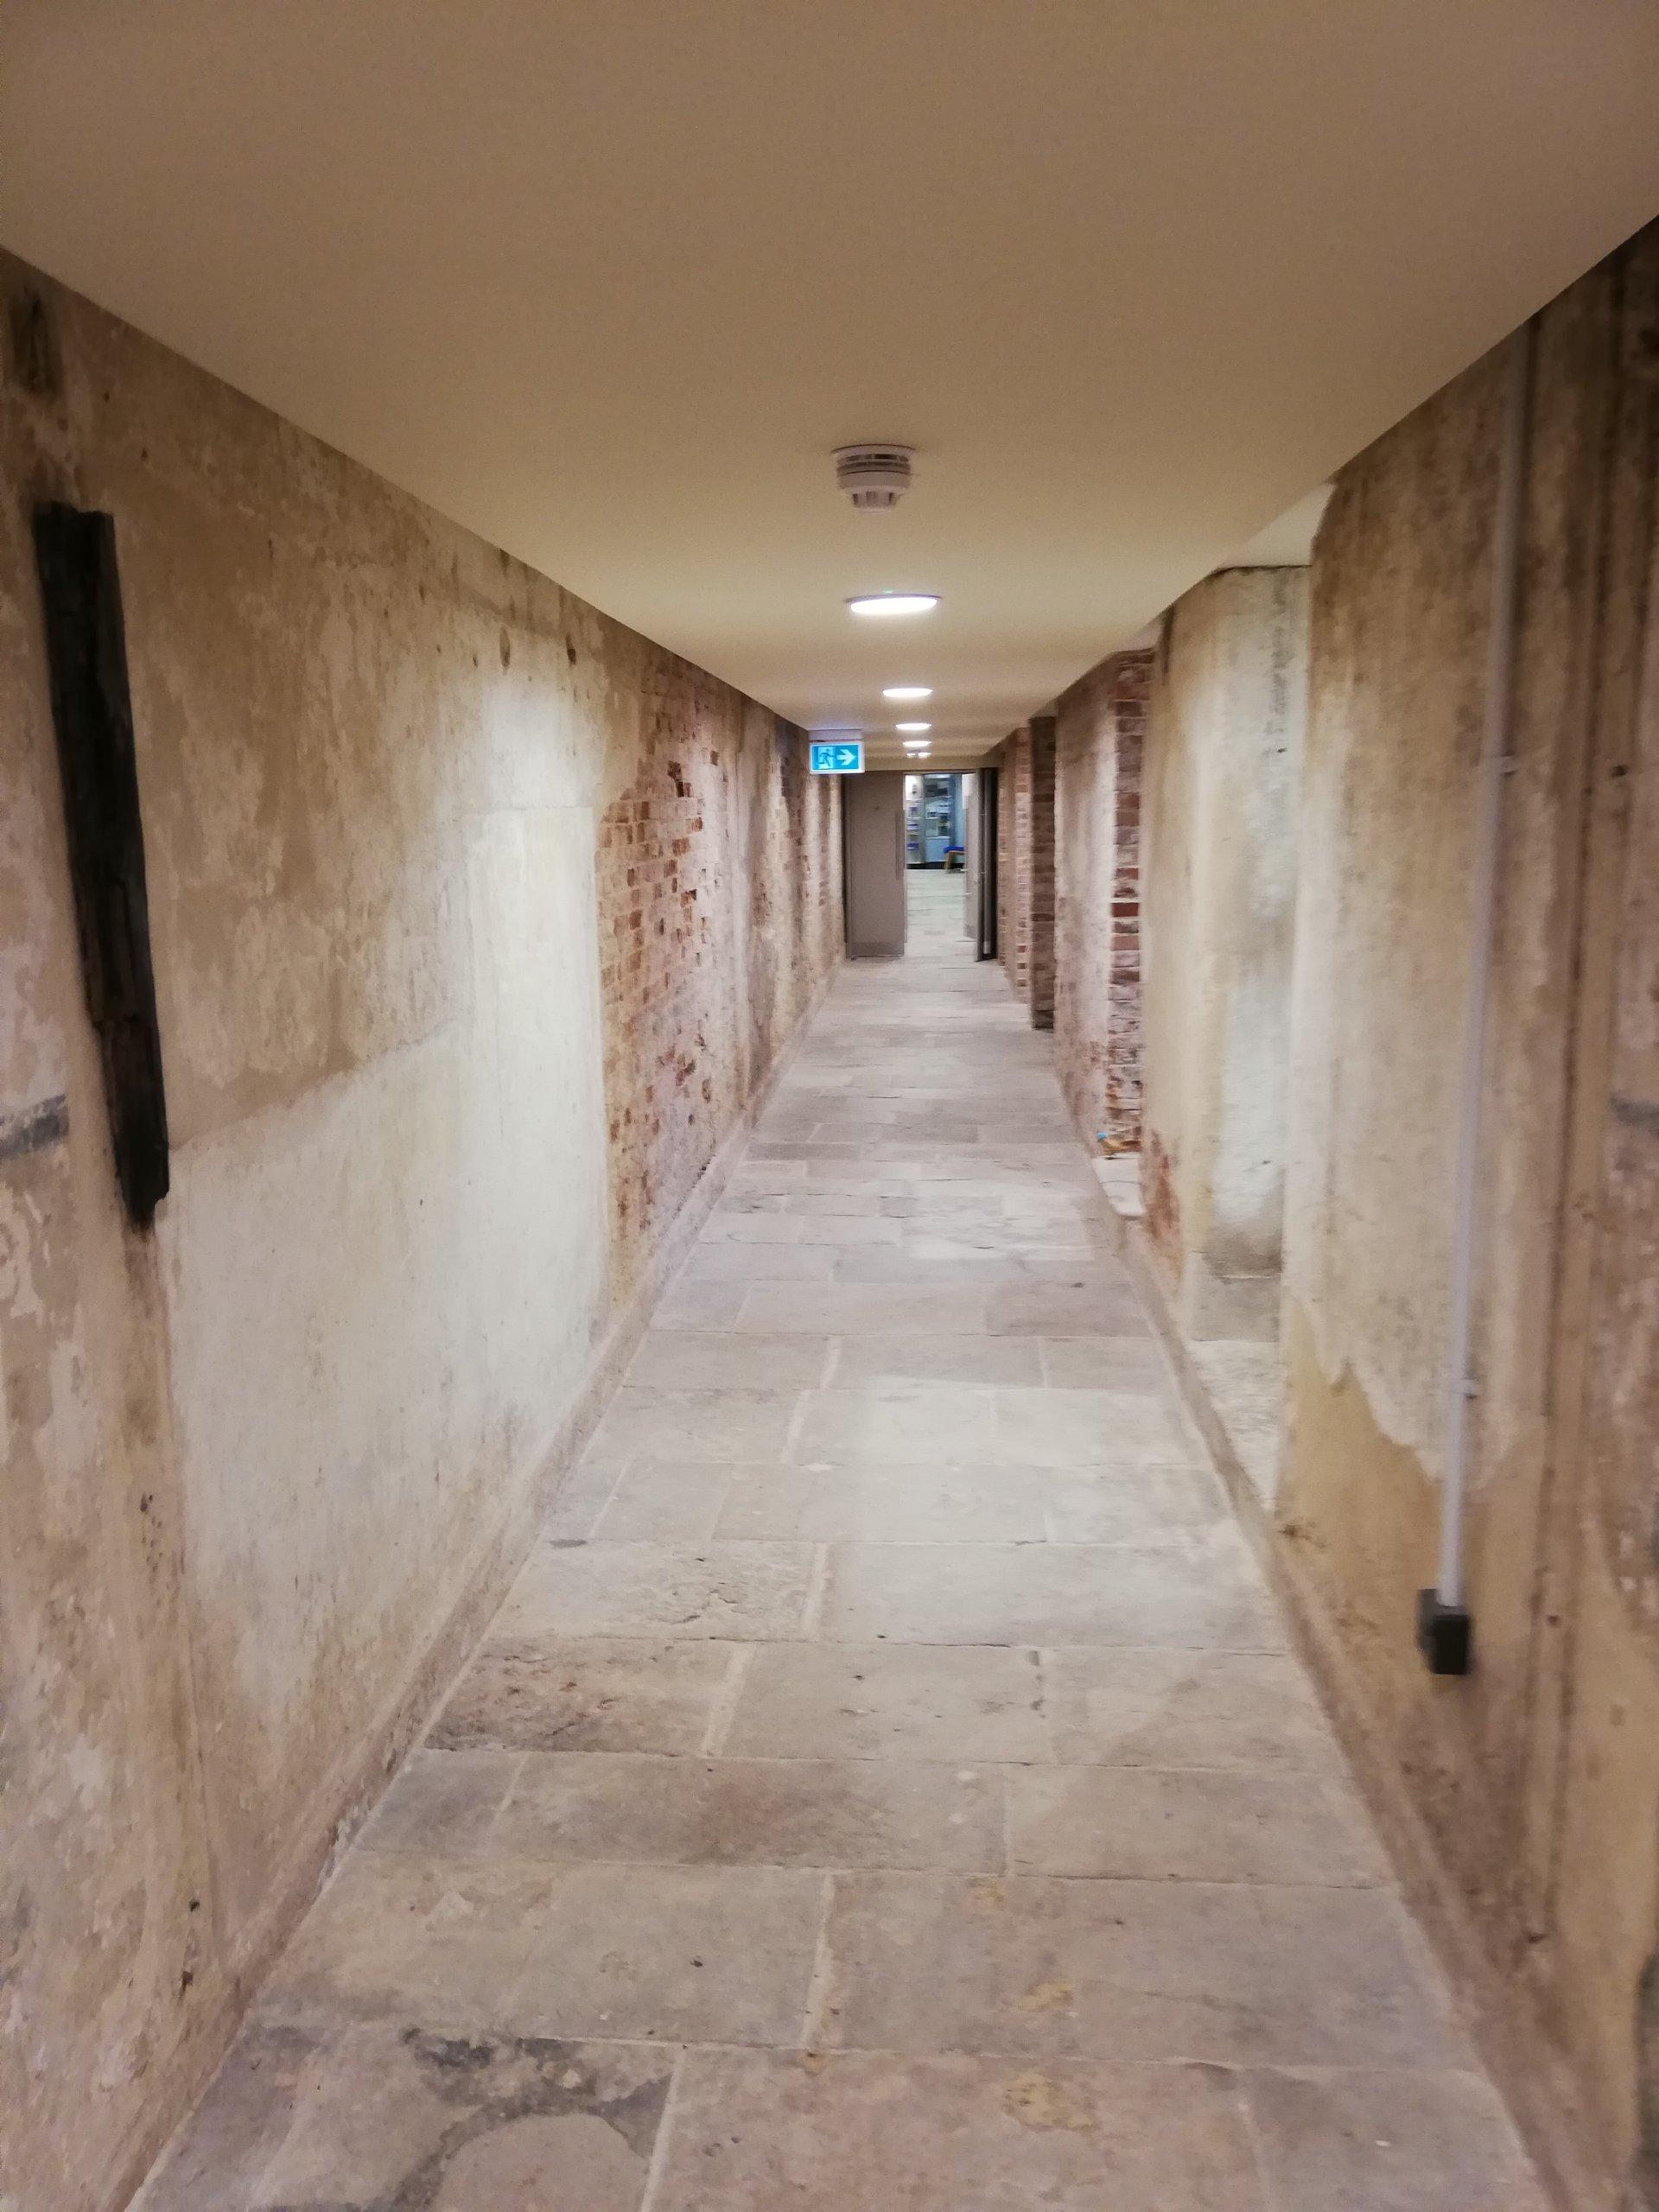 Spot the Duck - Dora hiding in the long stone basement corridor of Highcliffe Castle